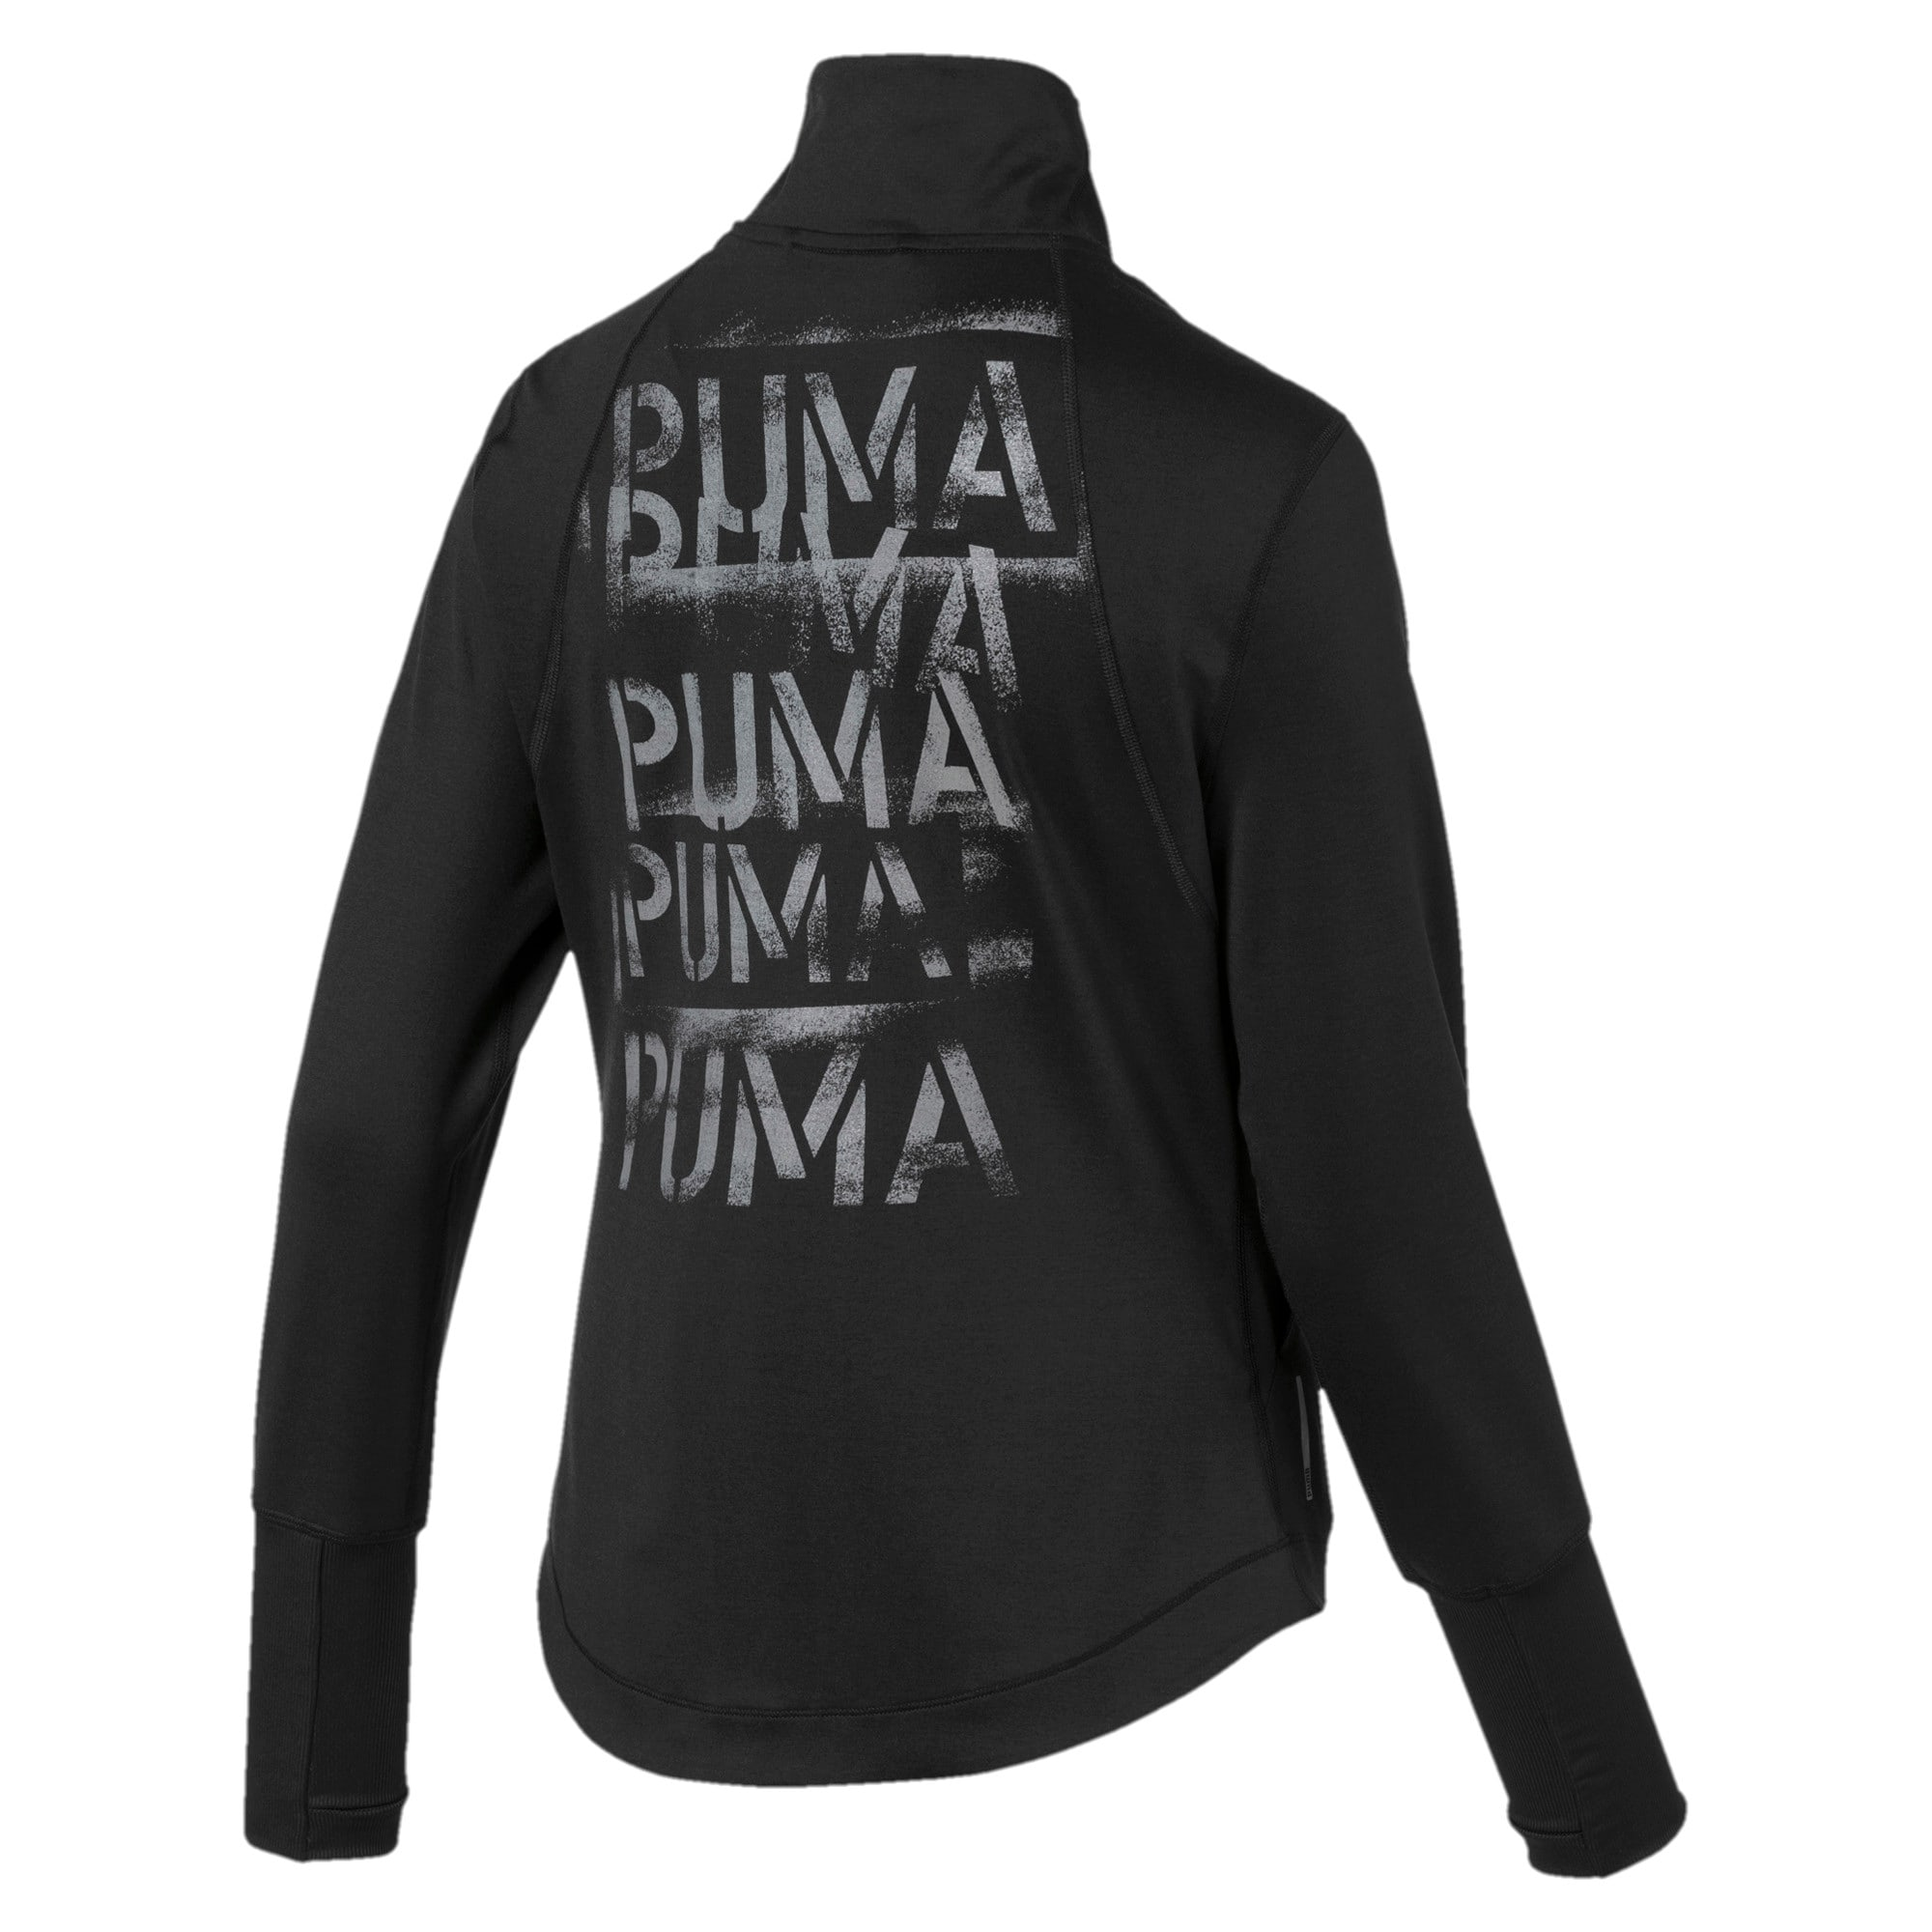 Thumbnail 4 of Studio Knit Women's Training Jacket, Puma Black, medium